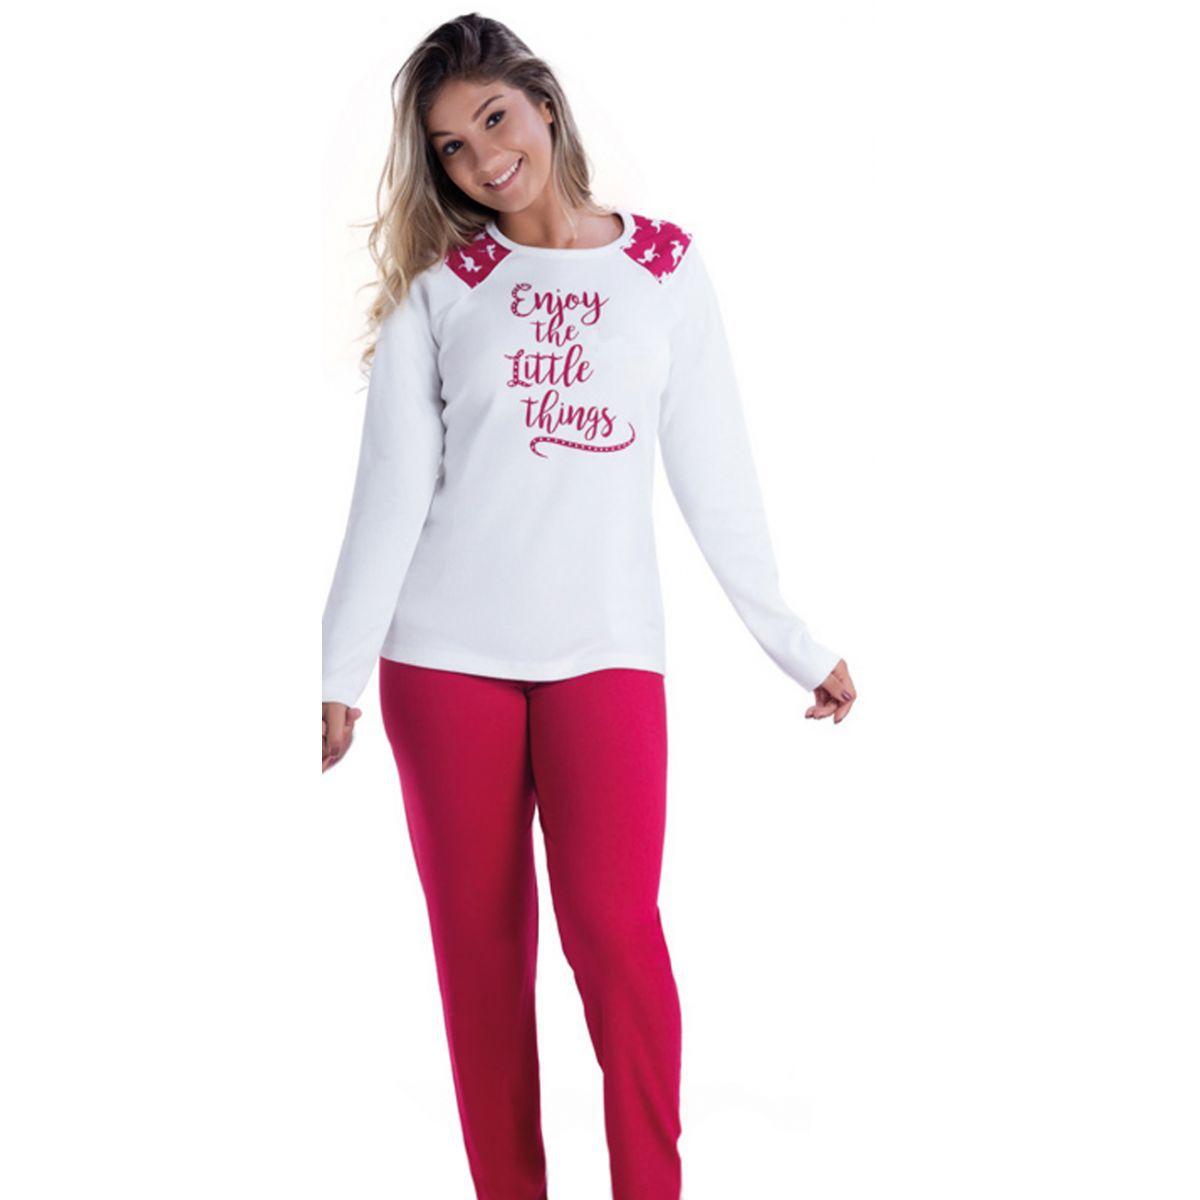 Pijama Feminino Inverno Adulto - Victory 17100